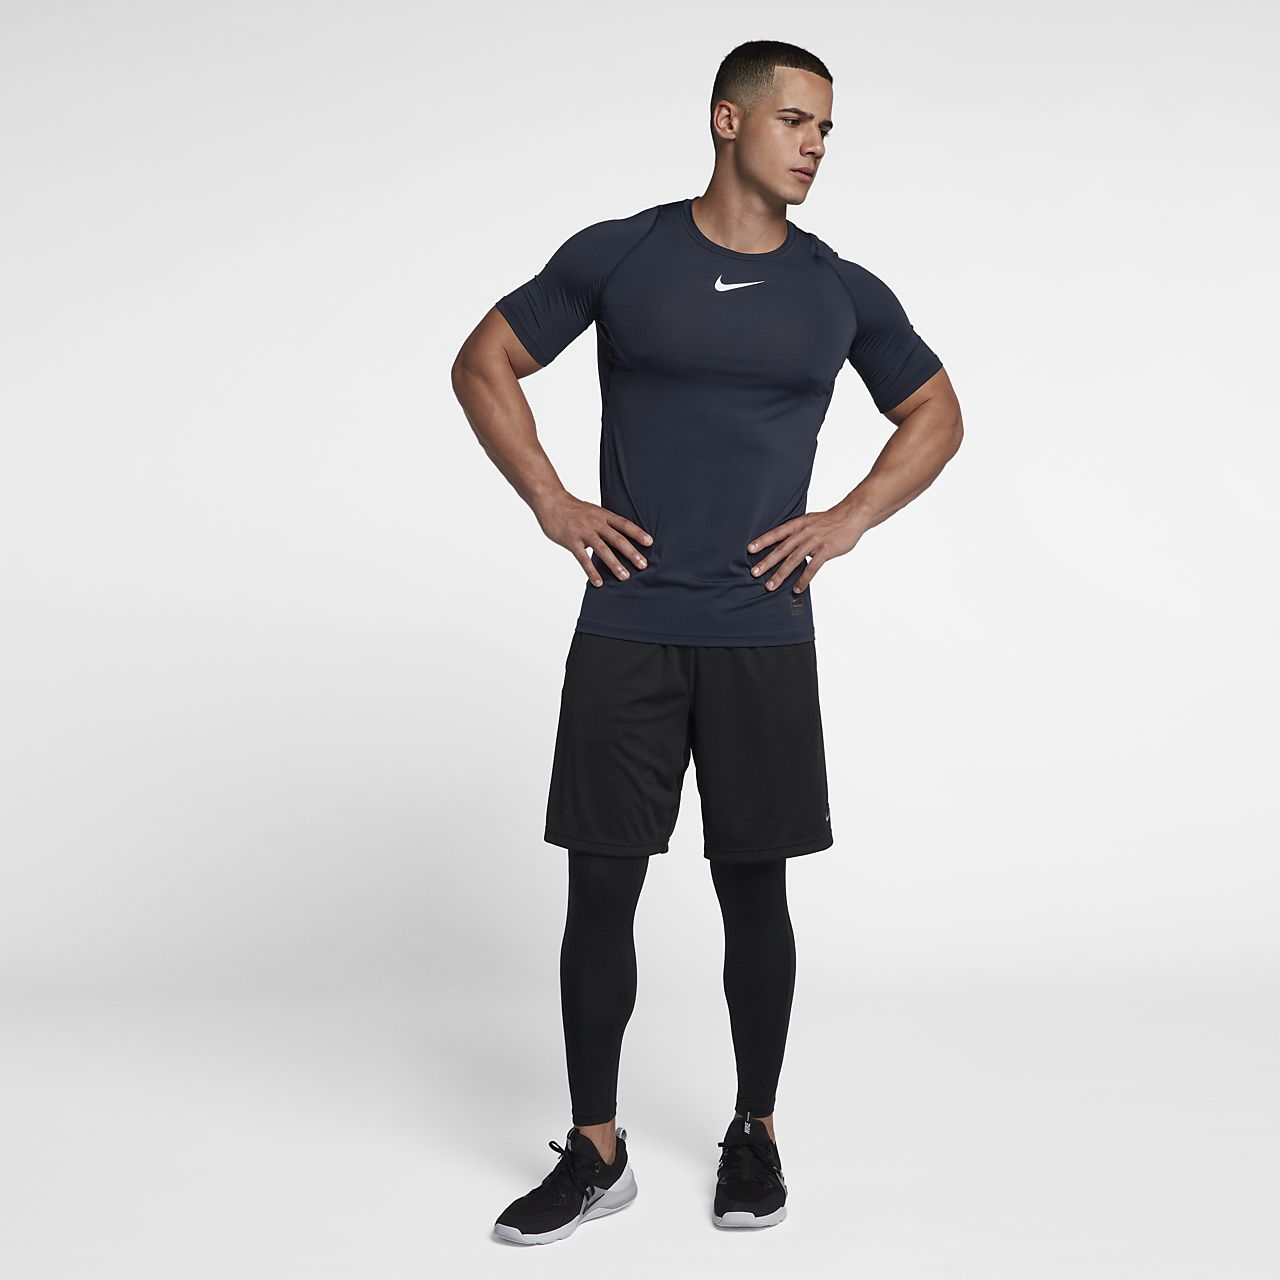 508349eaa7 Nike Pro Men's Training Top. Nike.com